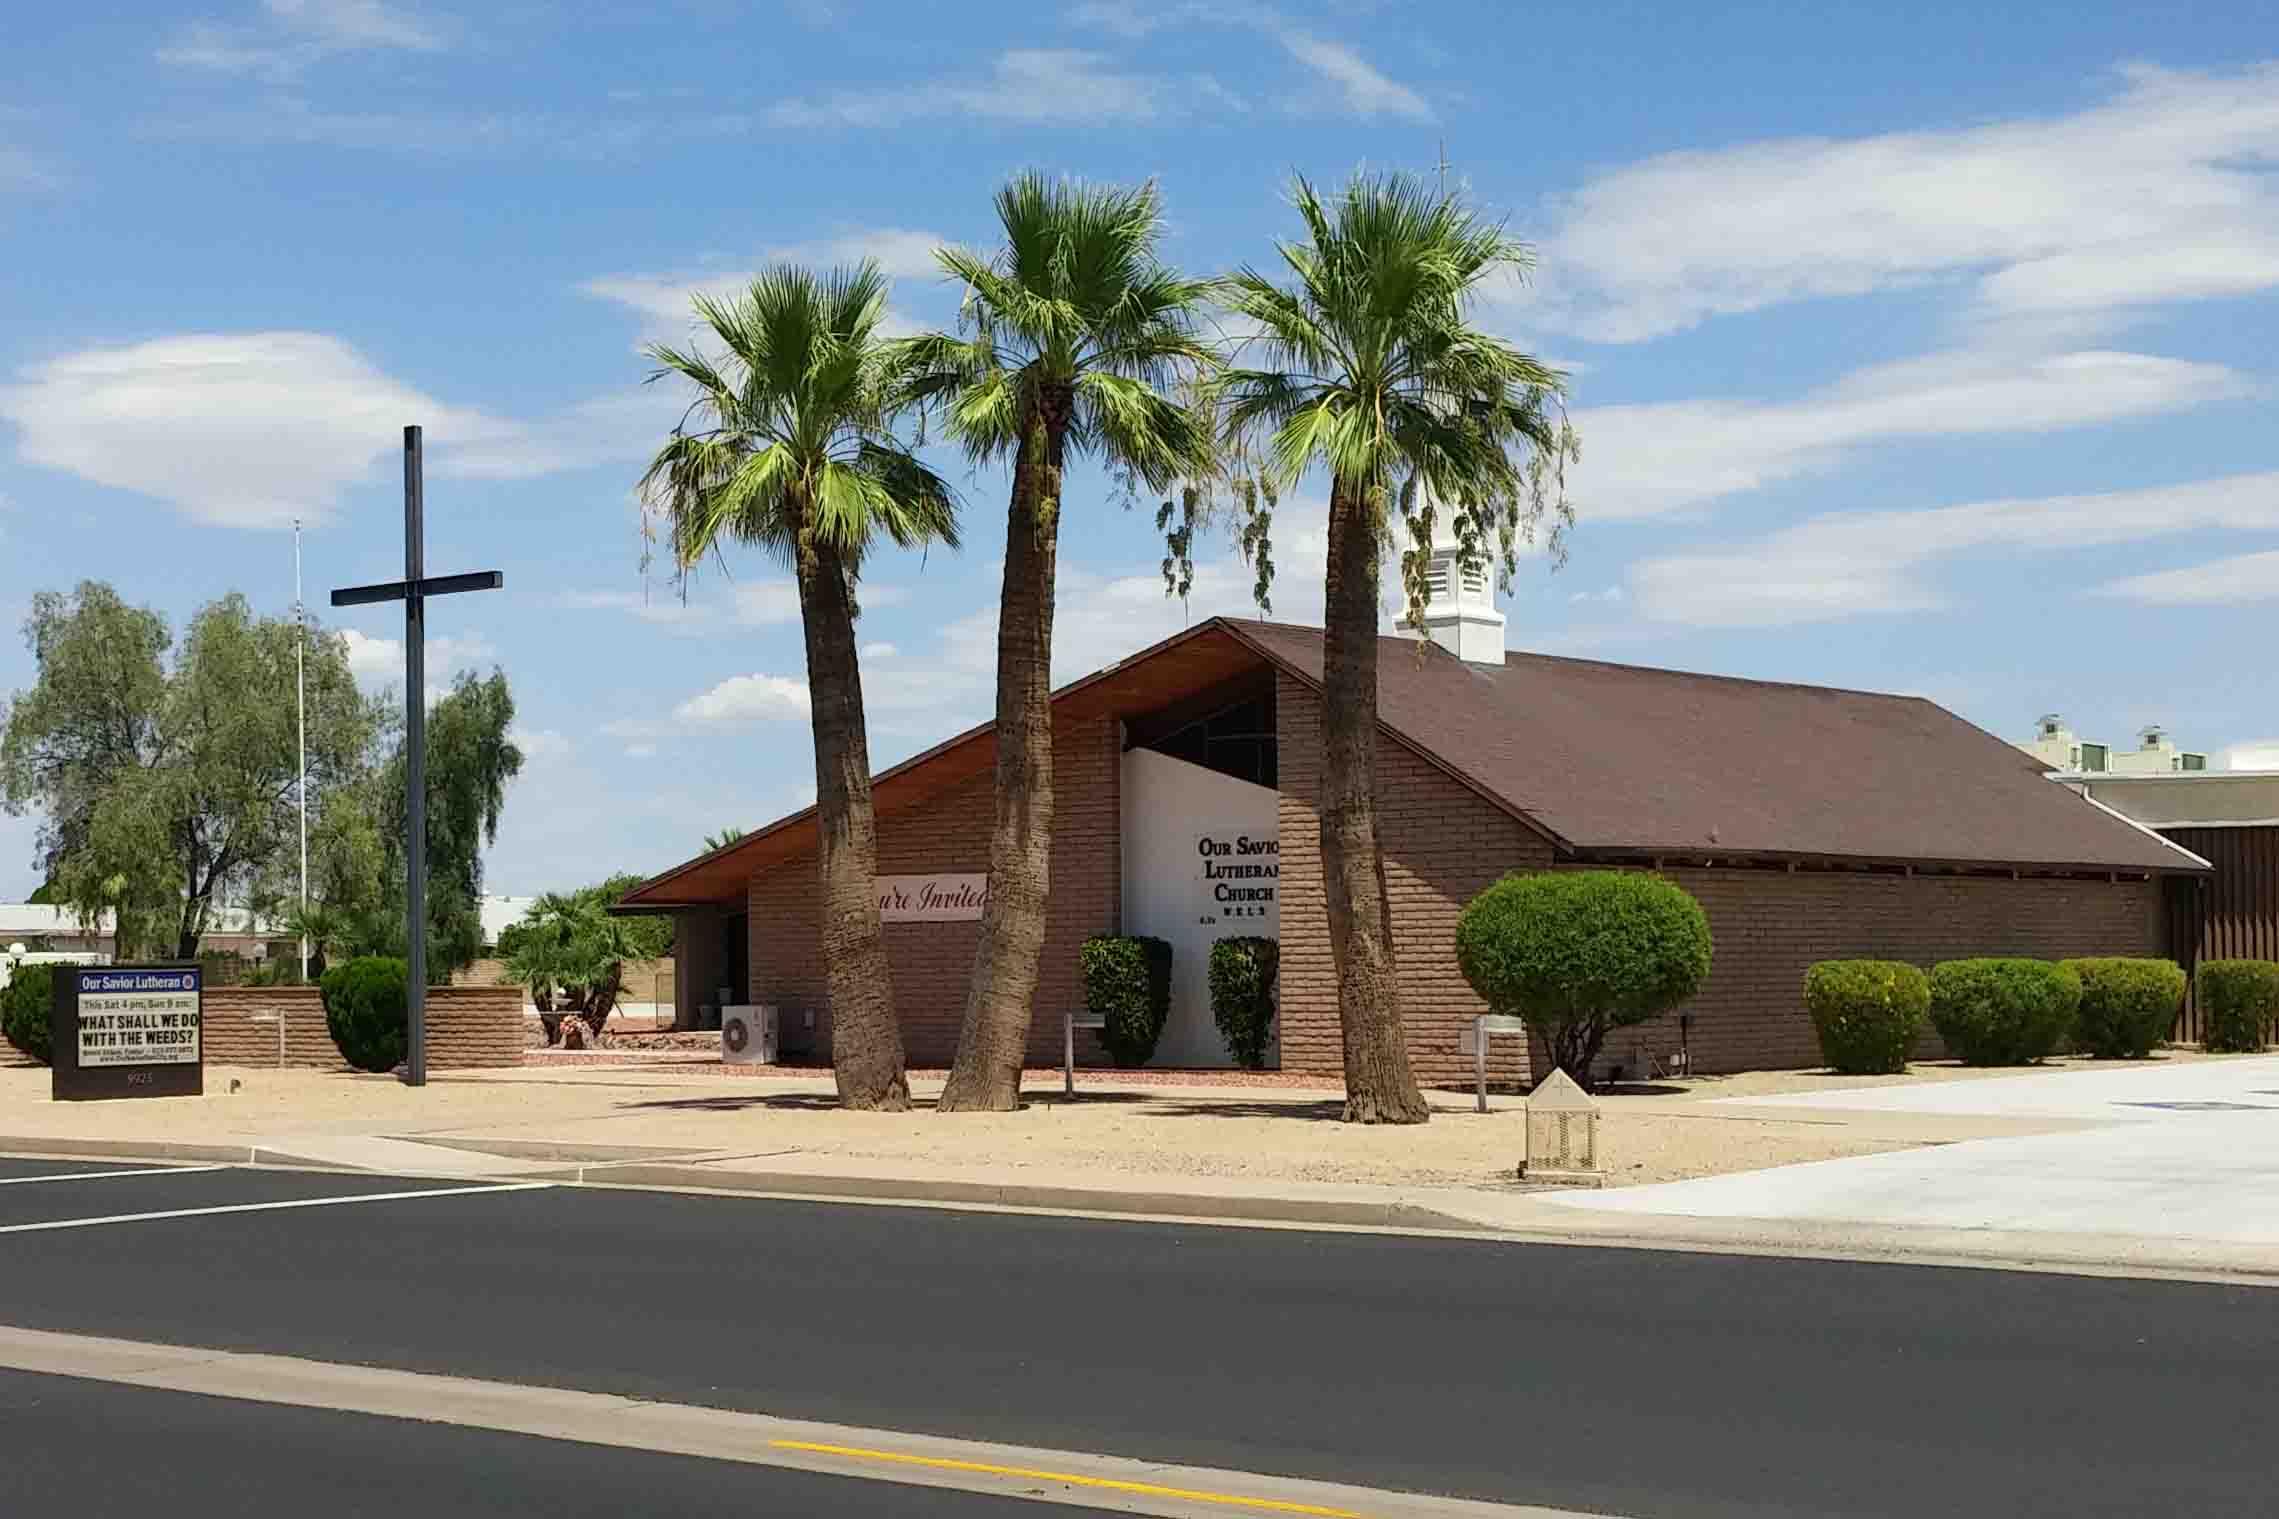 Our Savior, Sun City, AZ (Exterior)